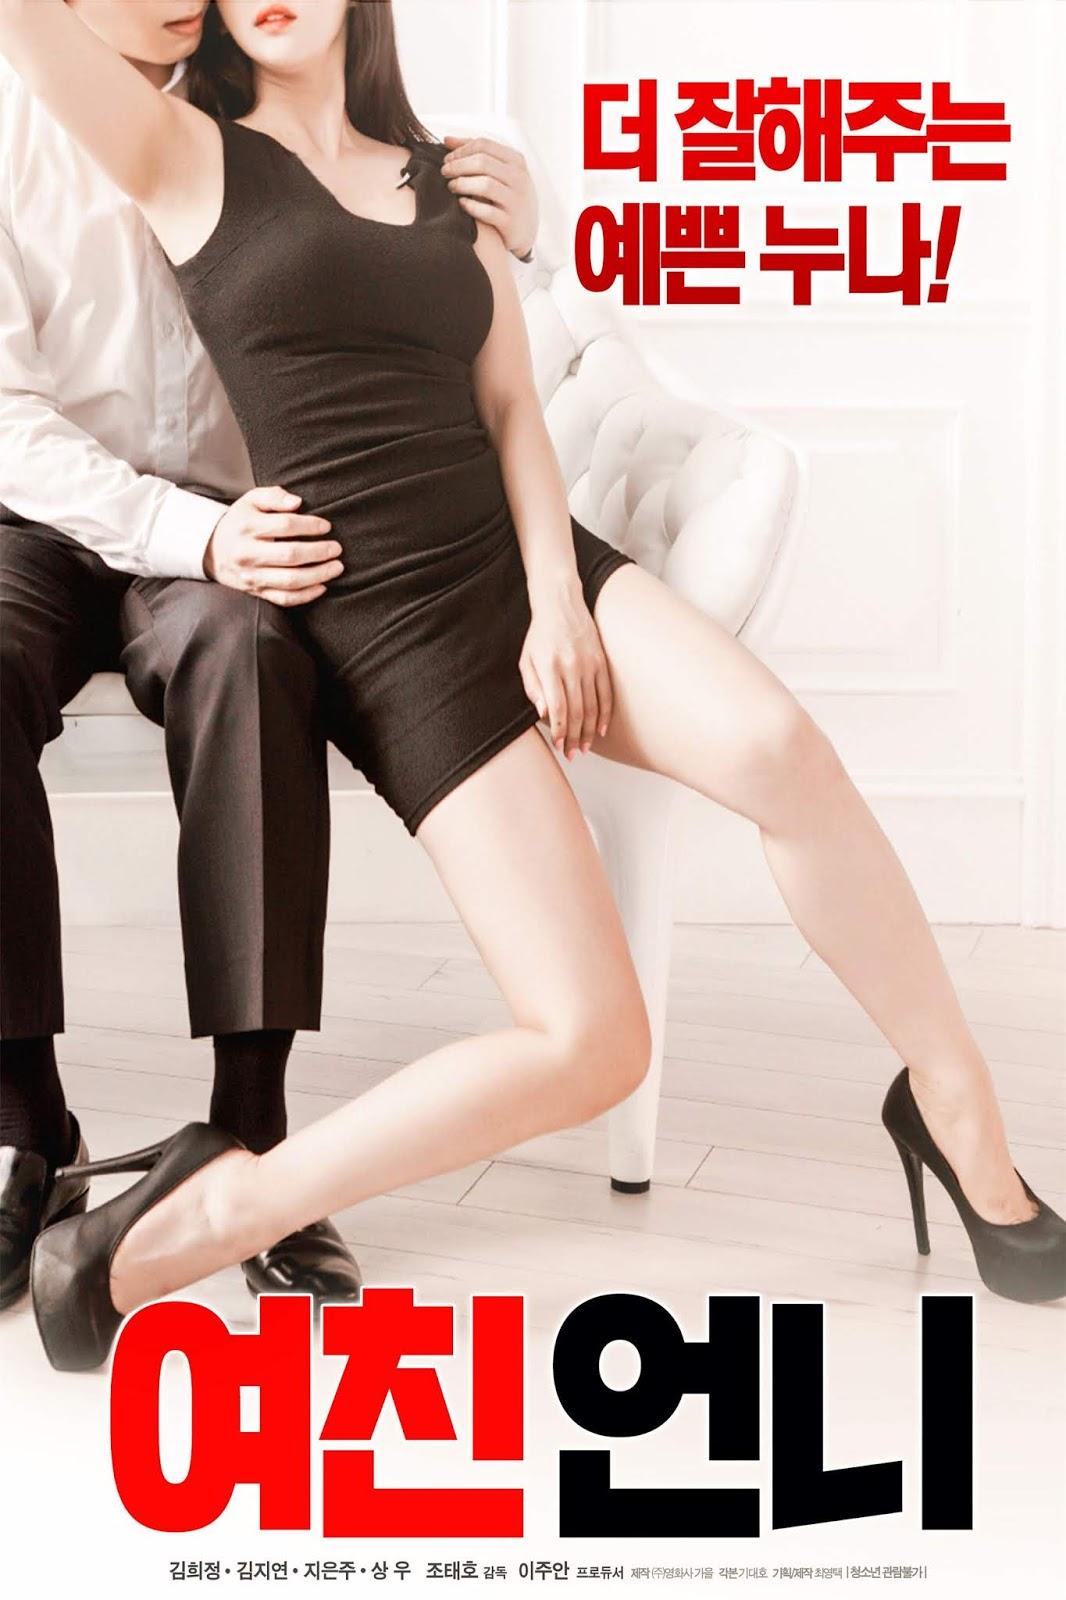 My Girlfriend 여친언니 (2018) Full Korea 18+ Adult Movie Online Free